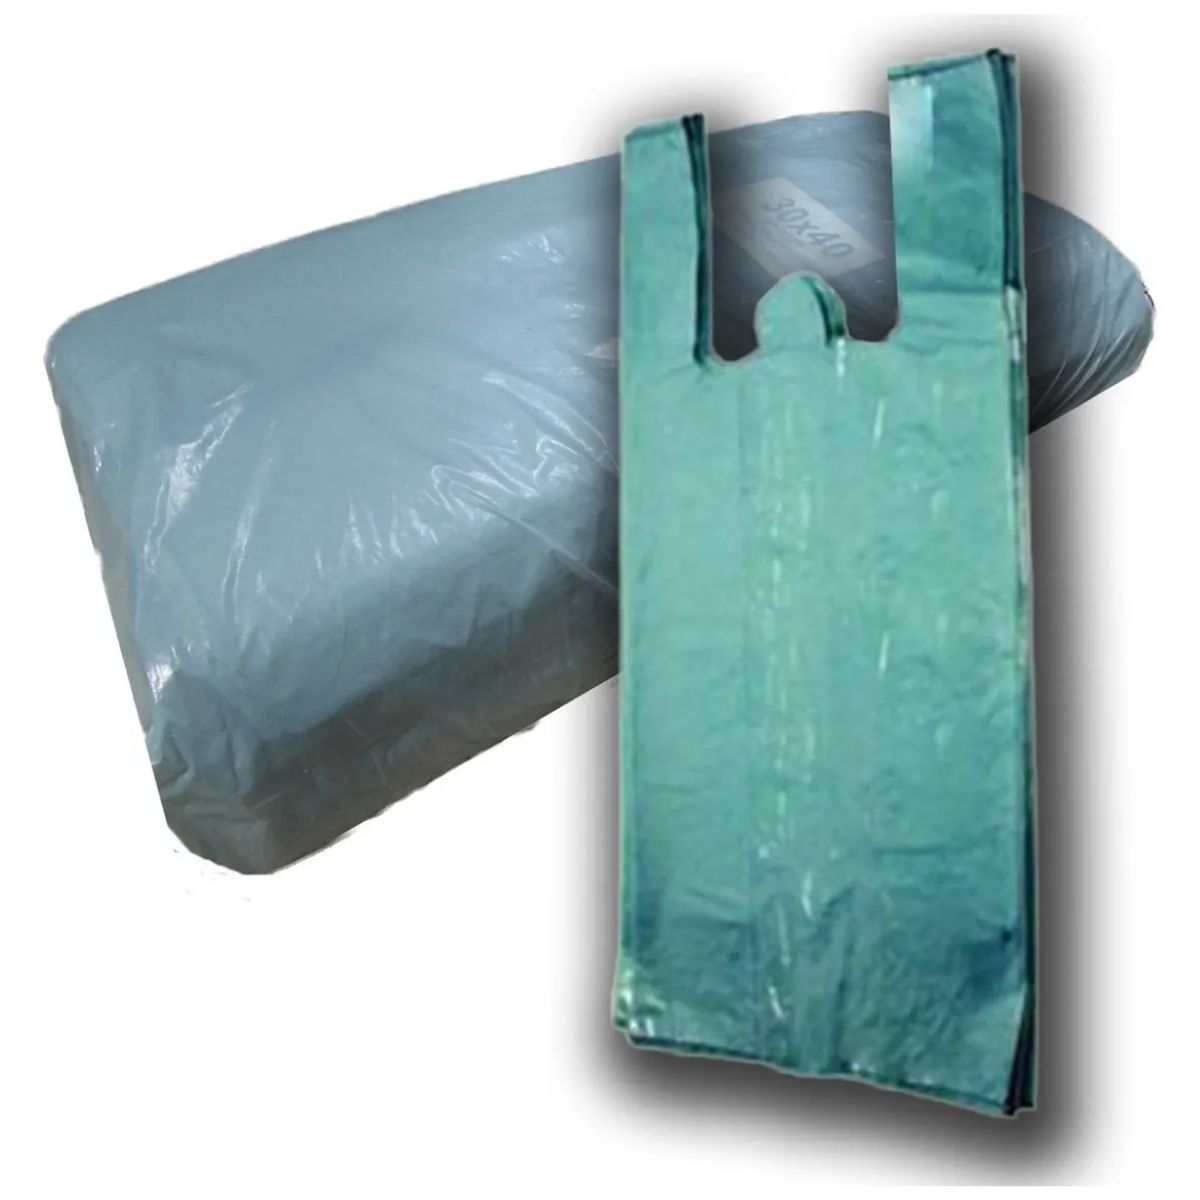 Sacola Reforçada 30x40 Verde Recuperada Reforçada 4kg